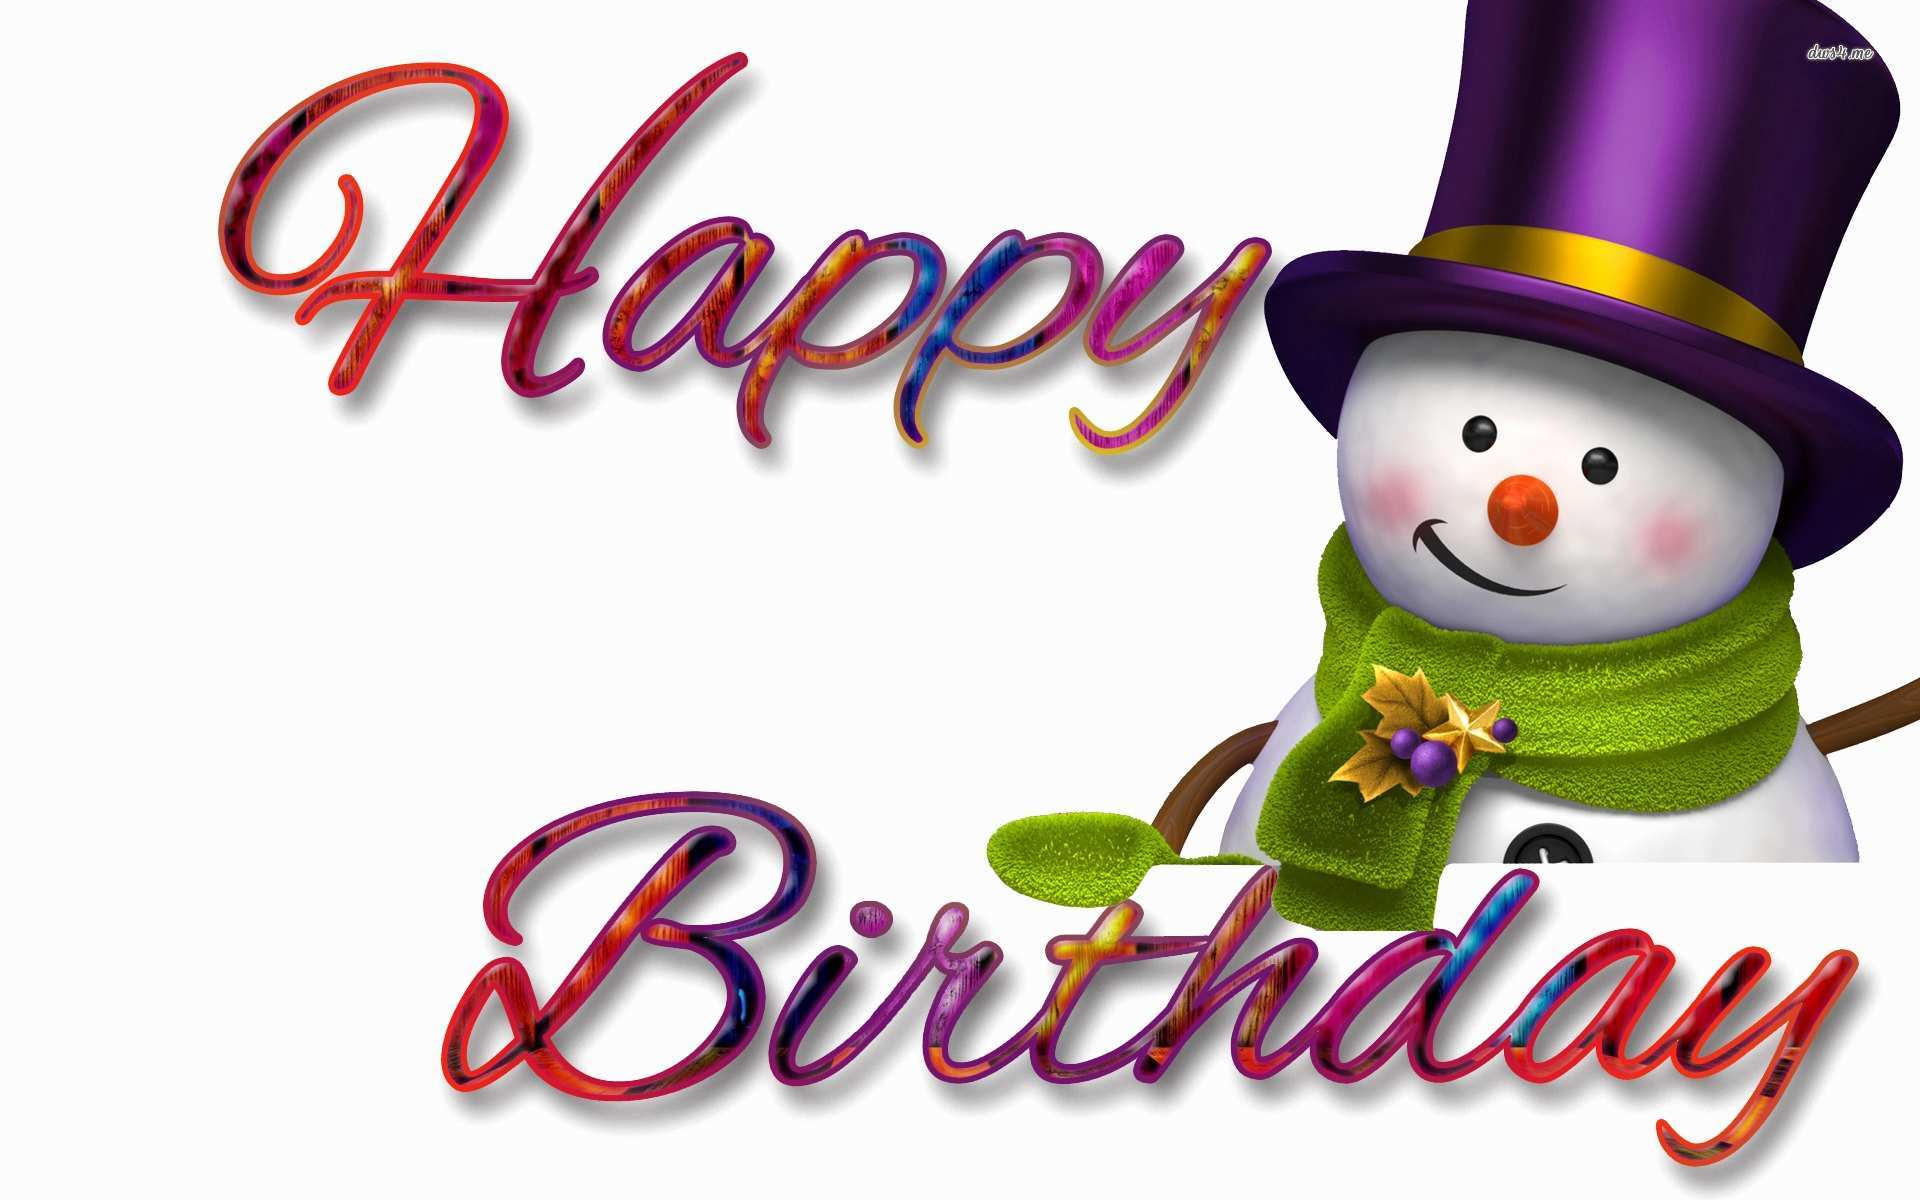 1920x1200 Funny Happy Birthday Brother Images Luxury Christmas Birthday